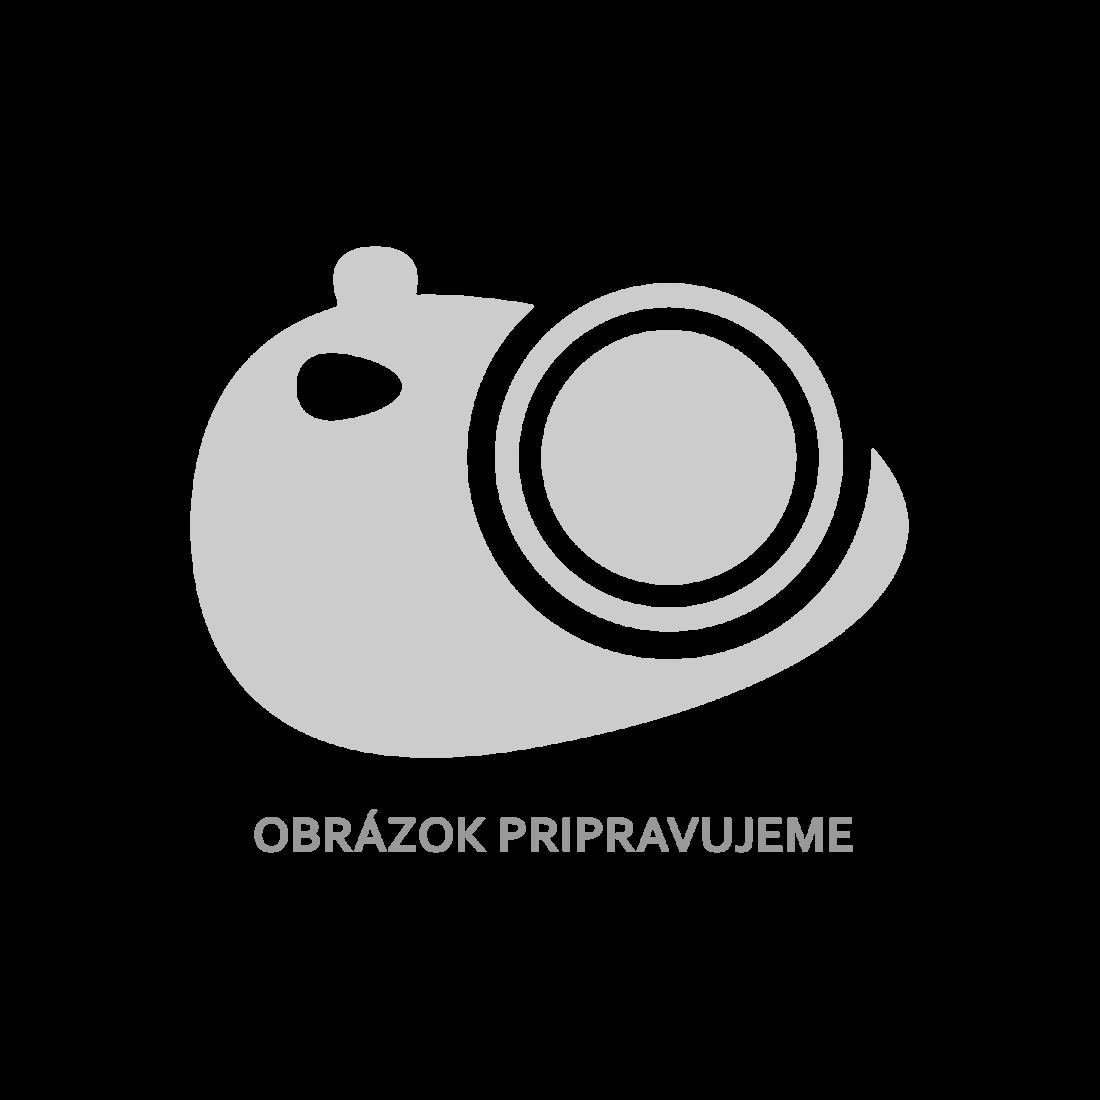 vidaXL Jídelní stůl dub sonoma 120 x 60 x 76 cm dřevotříska [800435]